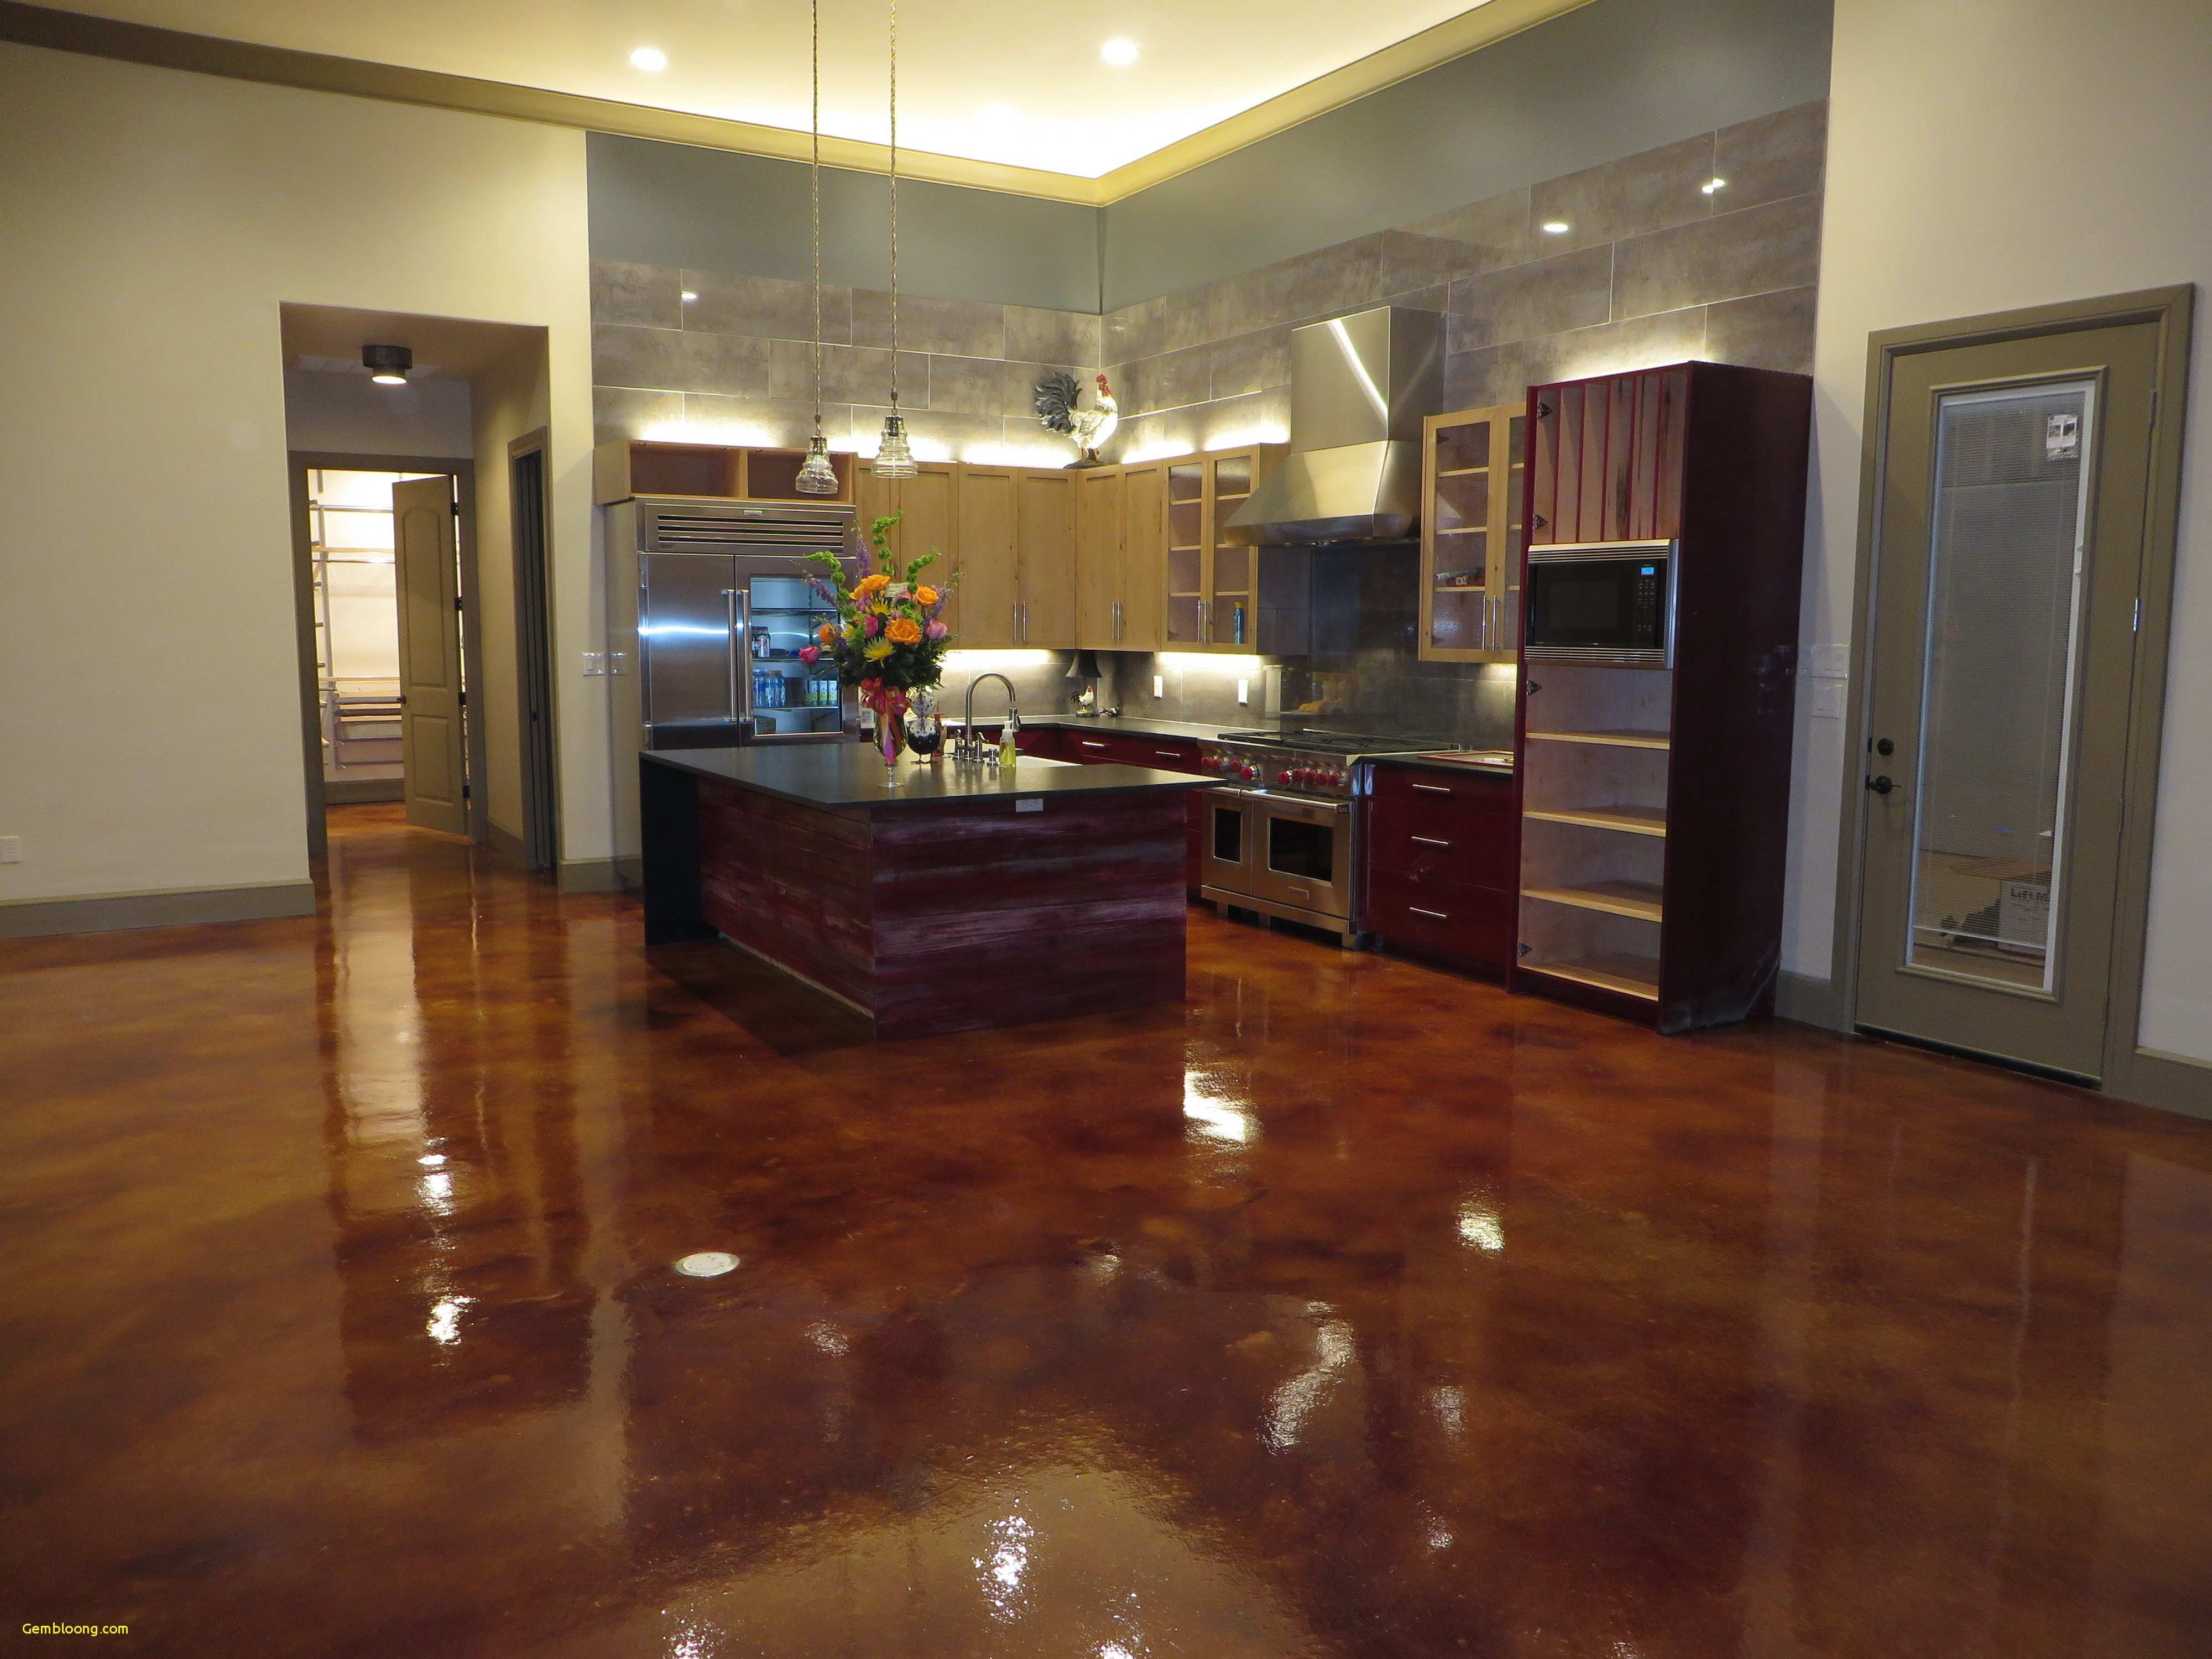 hardwood floor with tile of wood for floors facesinnature in wood home plans elegant pole building home plans free floor plan luxury design plan 0d house